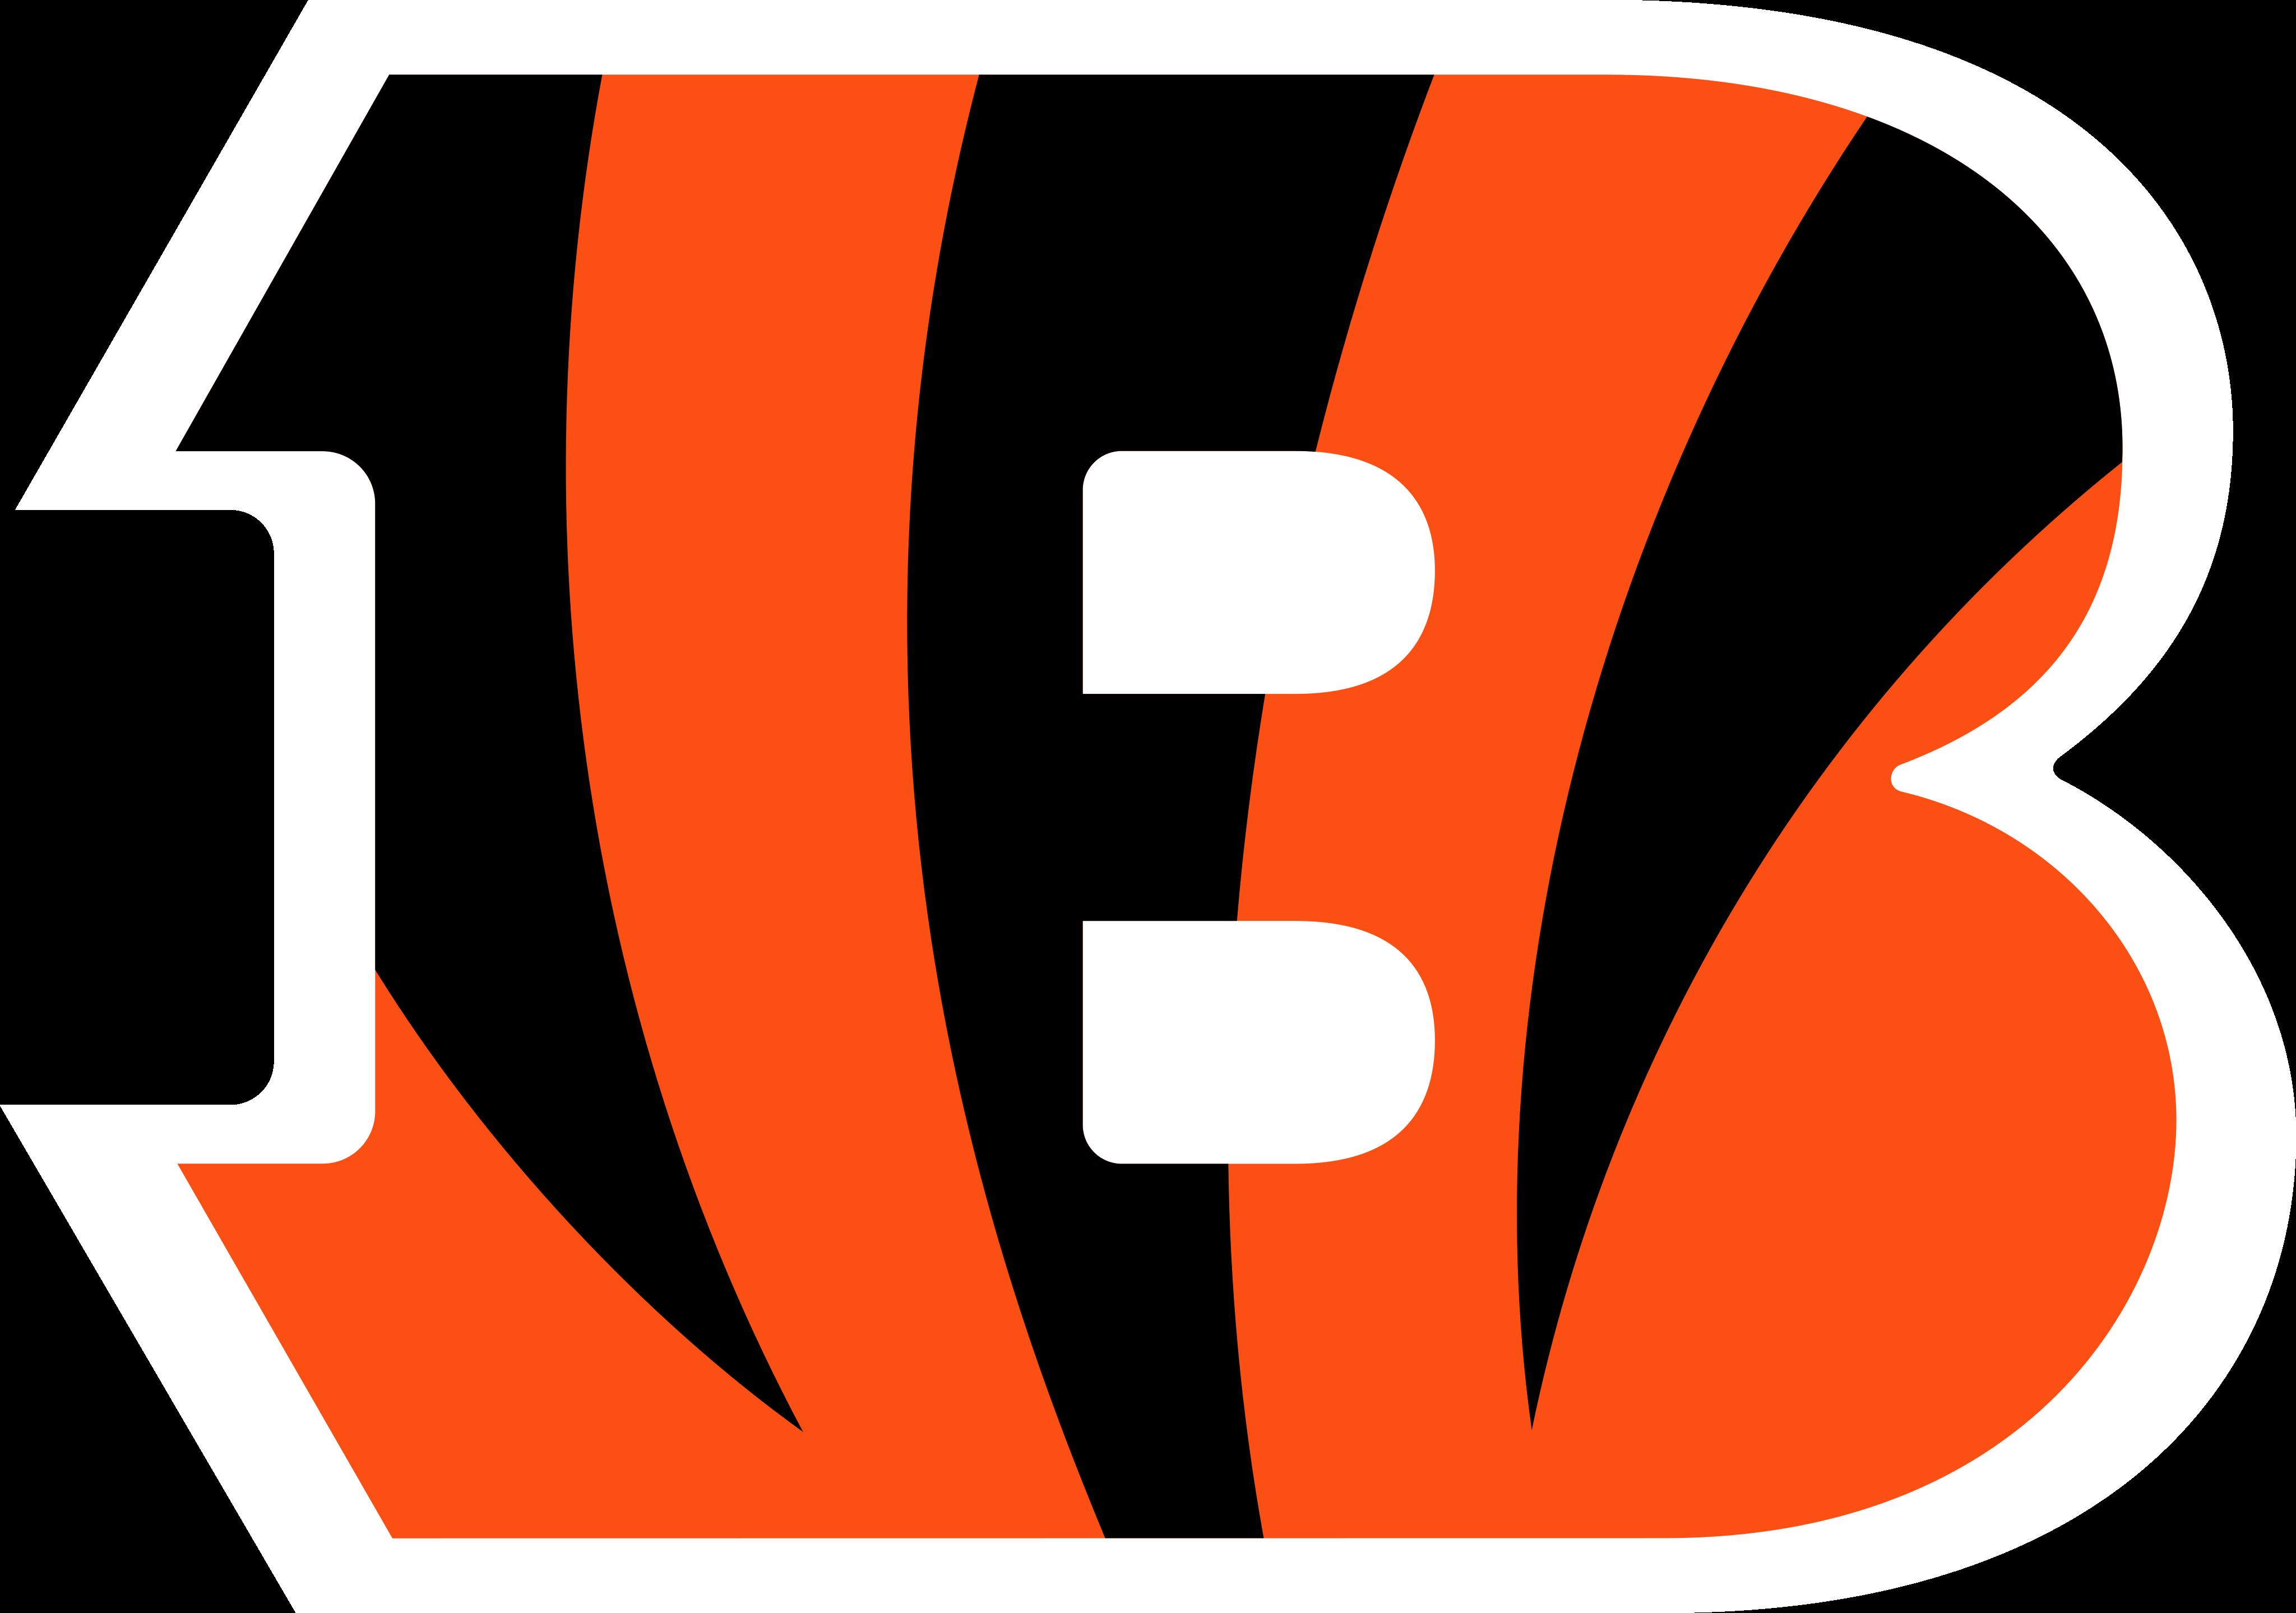 cincinnati bengals logo 1 - Cincinnati Bengals Logo